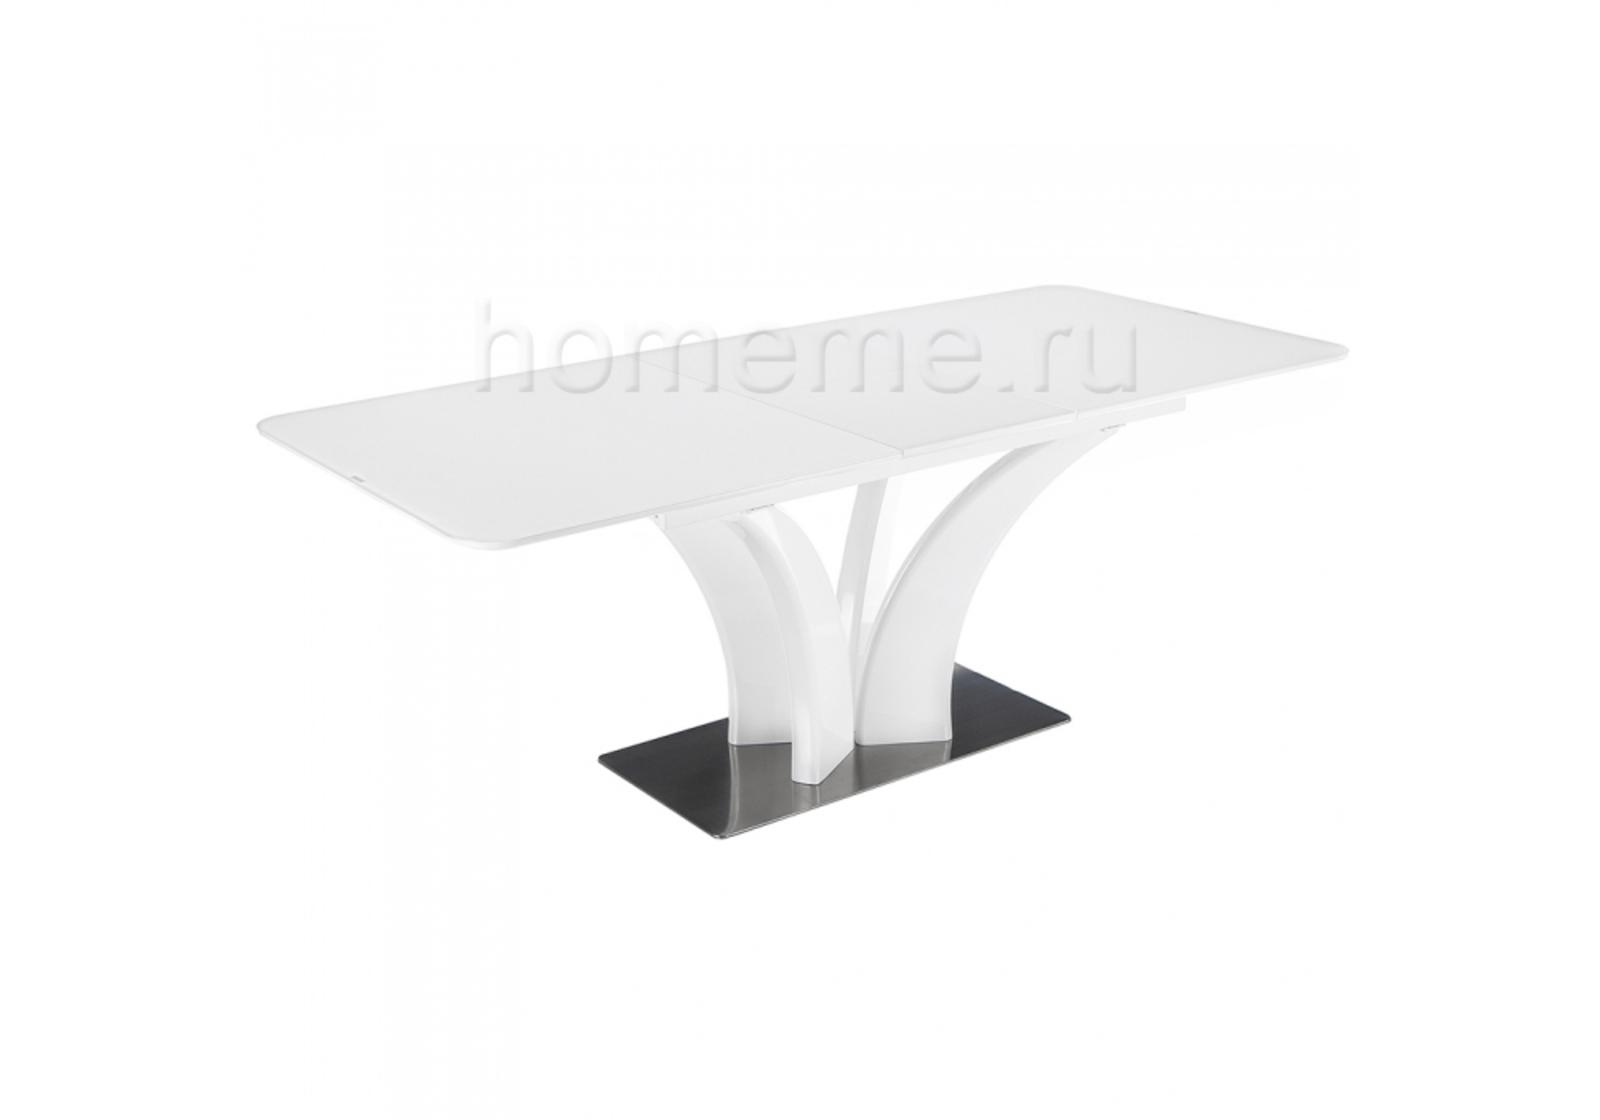 Стол стеклянный Horns 160 super white 11188 Horns 160 super white 11188 (14418)